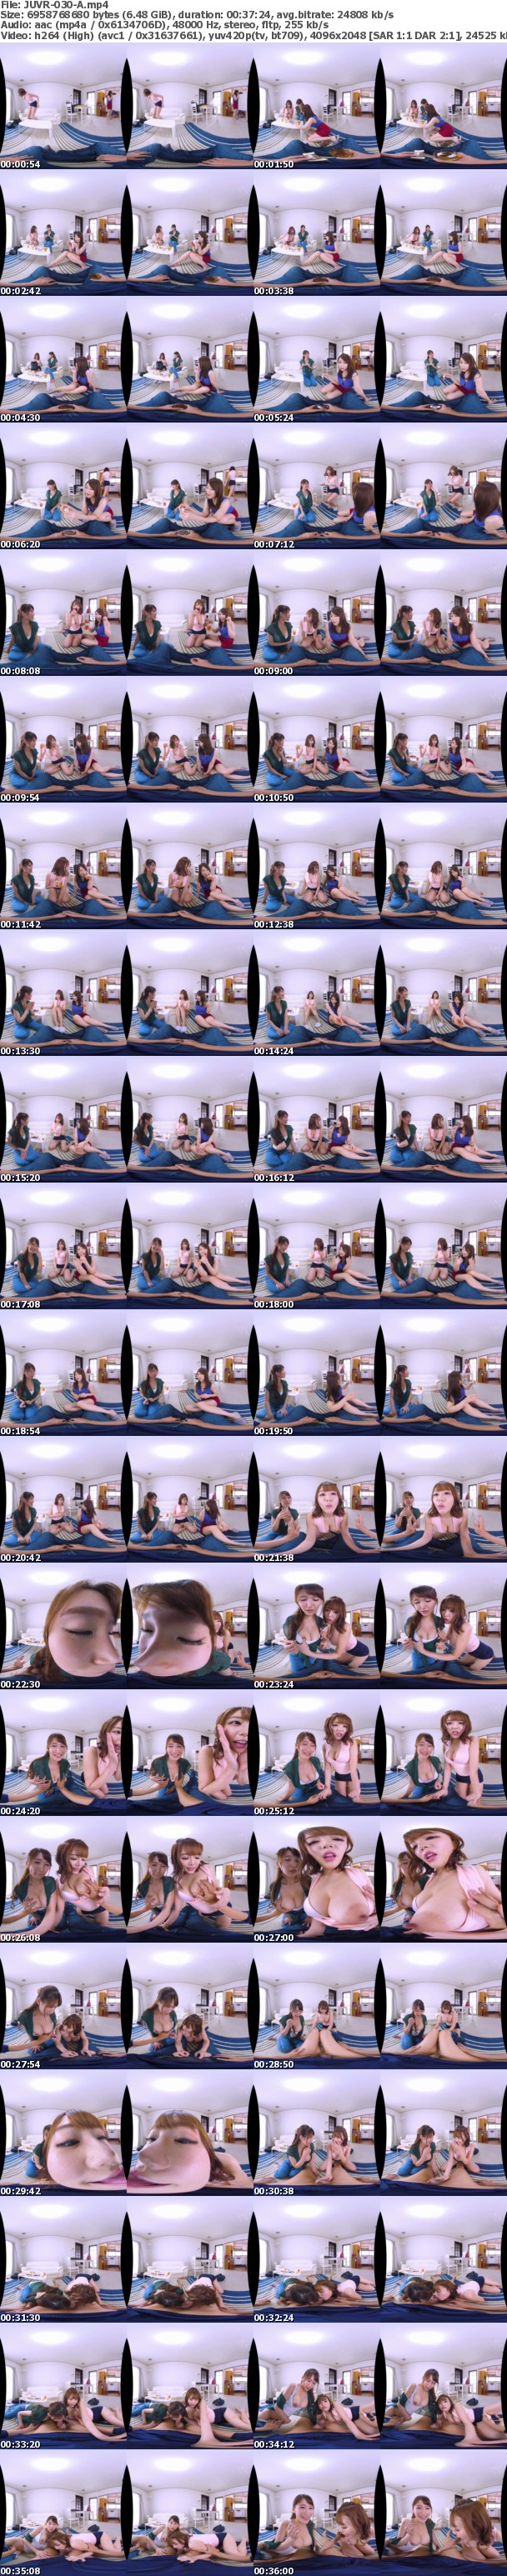 (VR) JUVR-030 僕の部屋がいつの間にか近所の奥様達の溜まり場! 全員SEXレスで欲求不満らしく昼飲みしてたらムラムラきちゃって我慢できずに僕のチ○コを弄り始めるエロハプニングVR